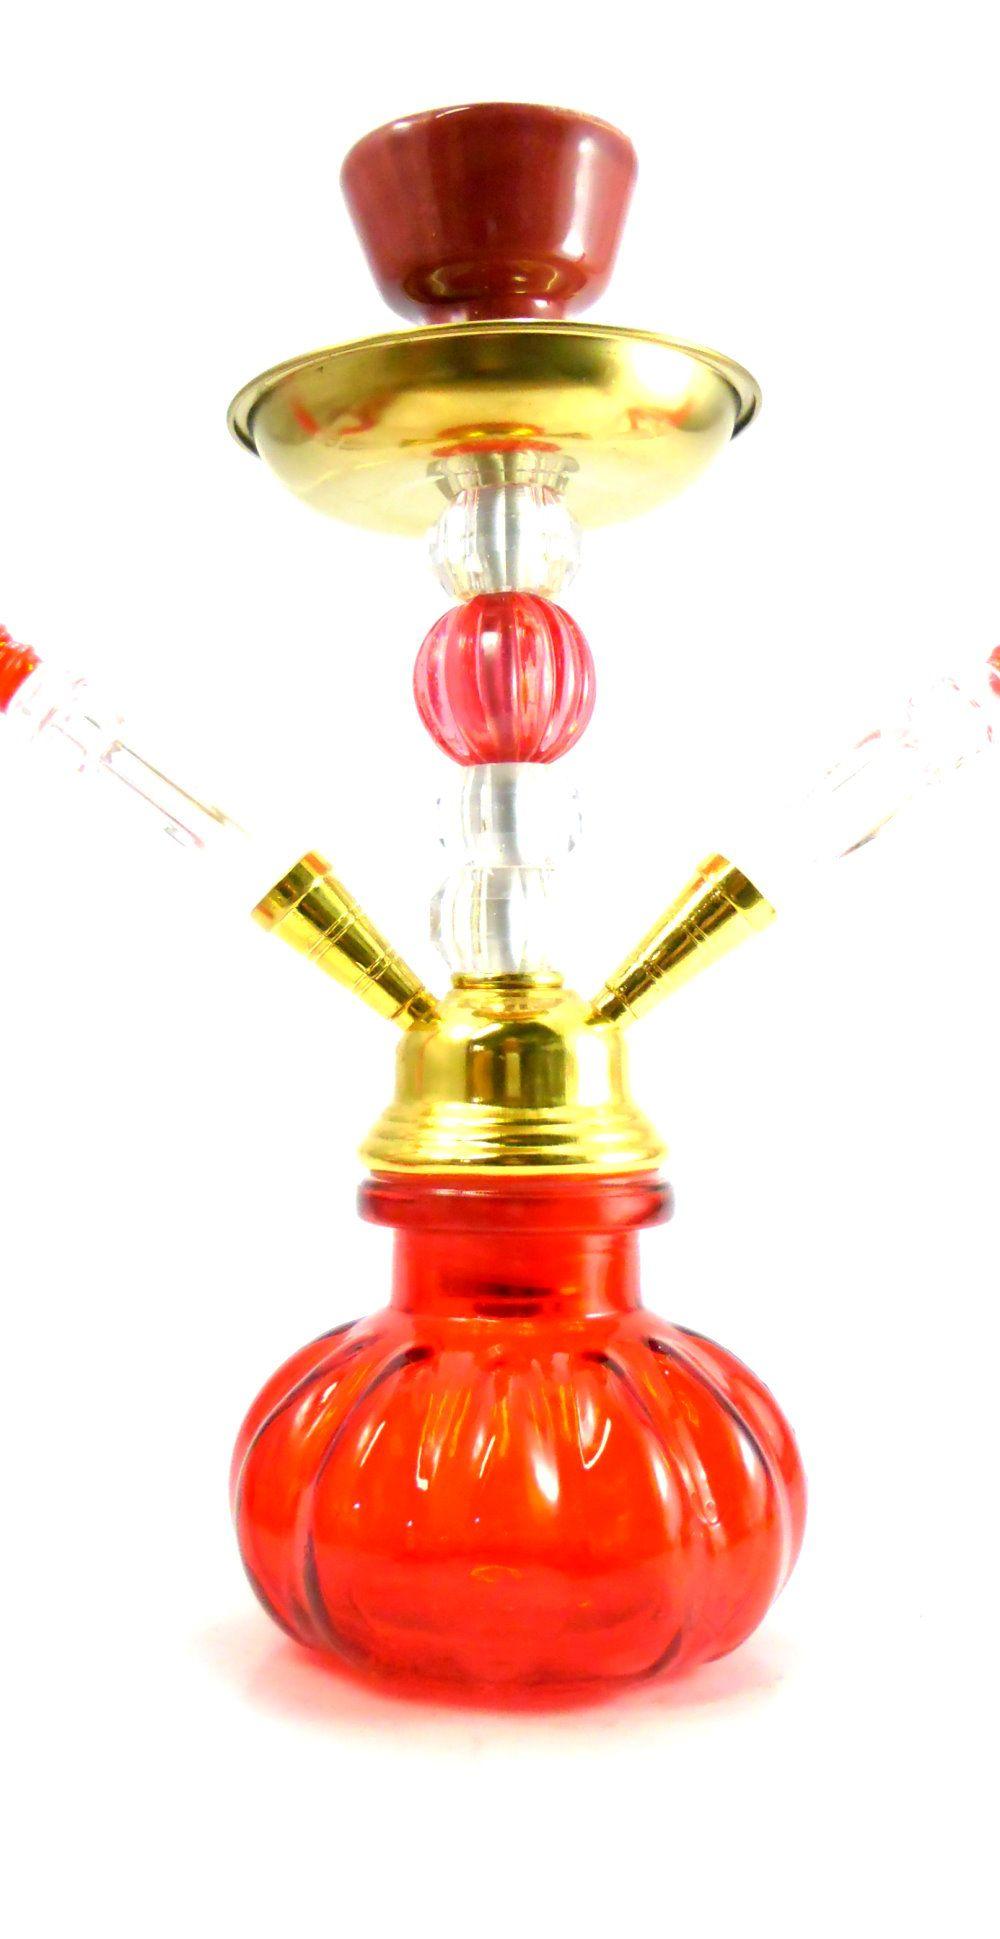 Narguile YAHYA compacto (30cm), duas mangueiras, vaso vidro VERMELHO, corpo tom DOURADO. Y011VRM